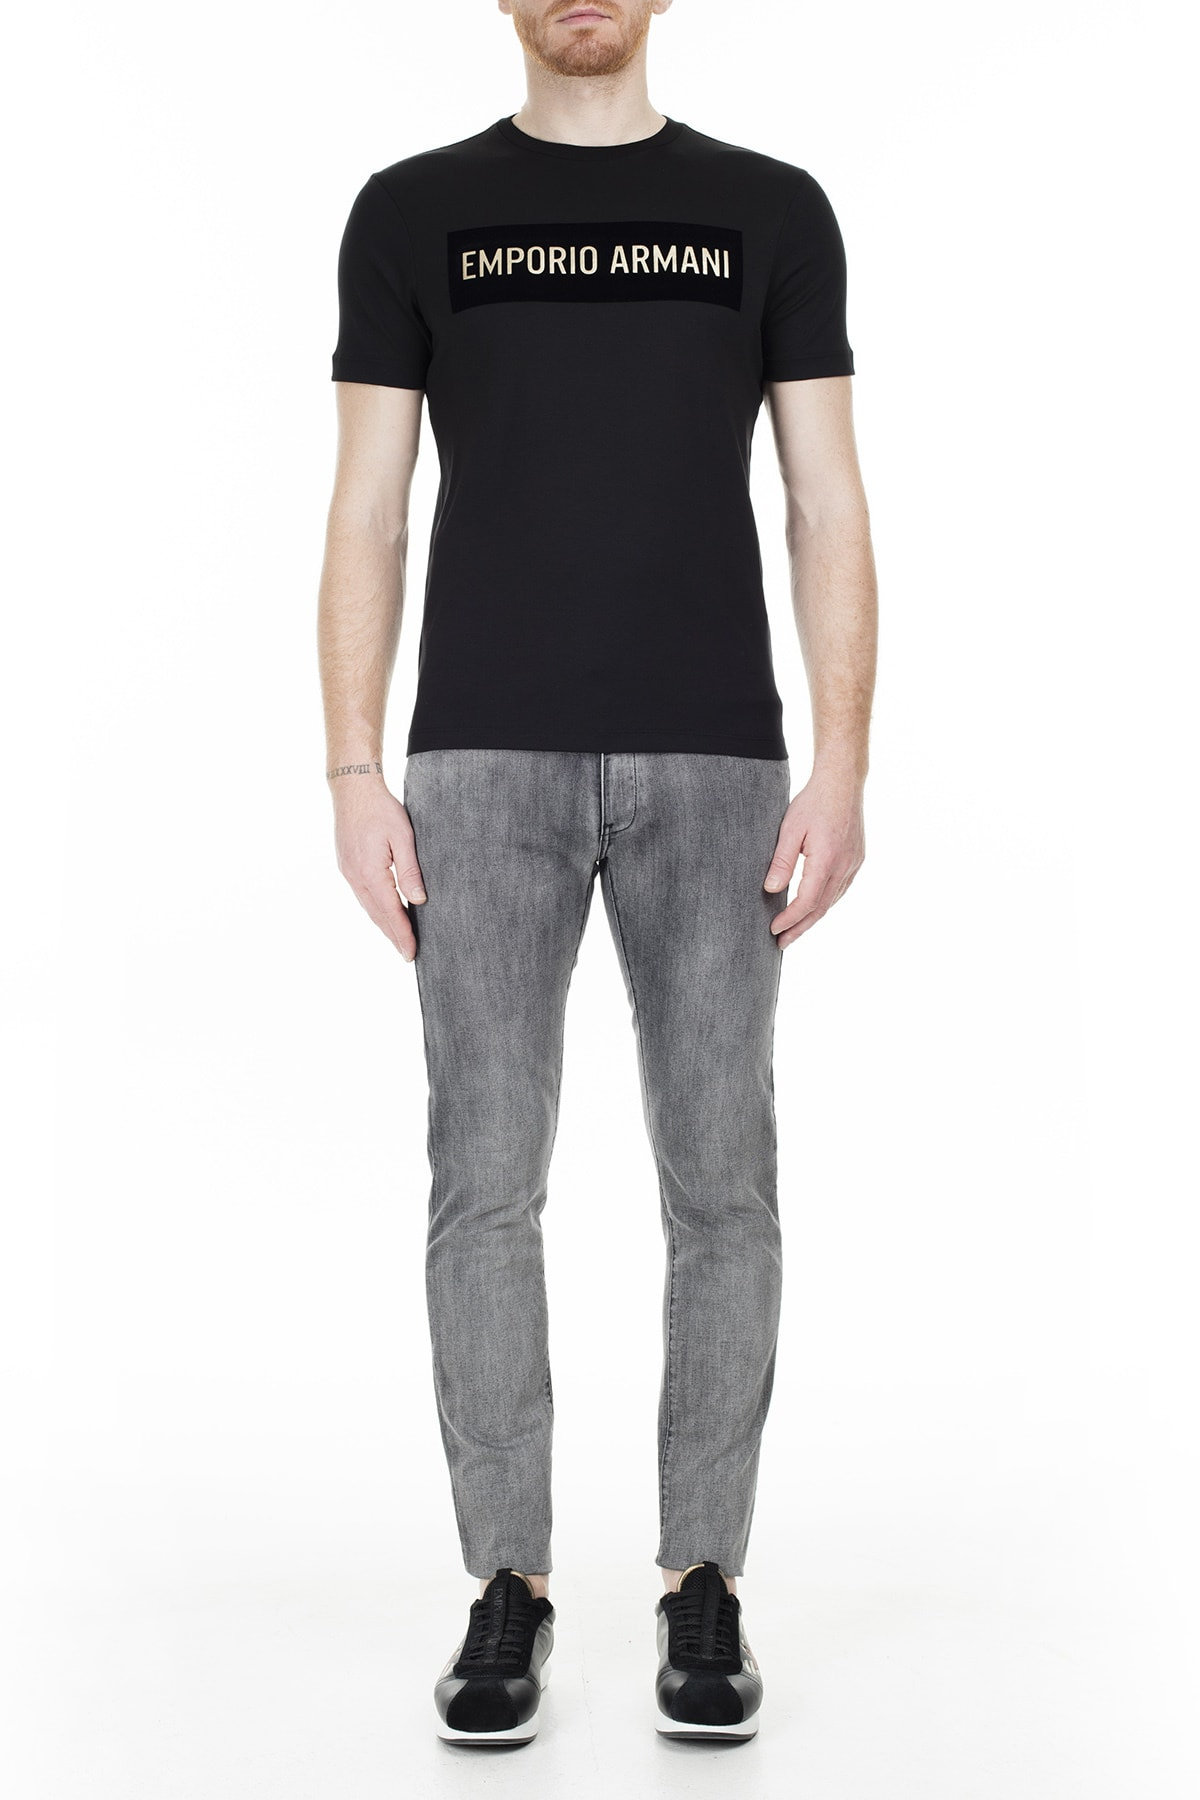 Emporio Armani J10 Jeans Erkek Kot Pantolon S 6G1J10 1D6Mz 0644 S 6G1J10 1D6MZ 0644 0